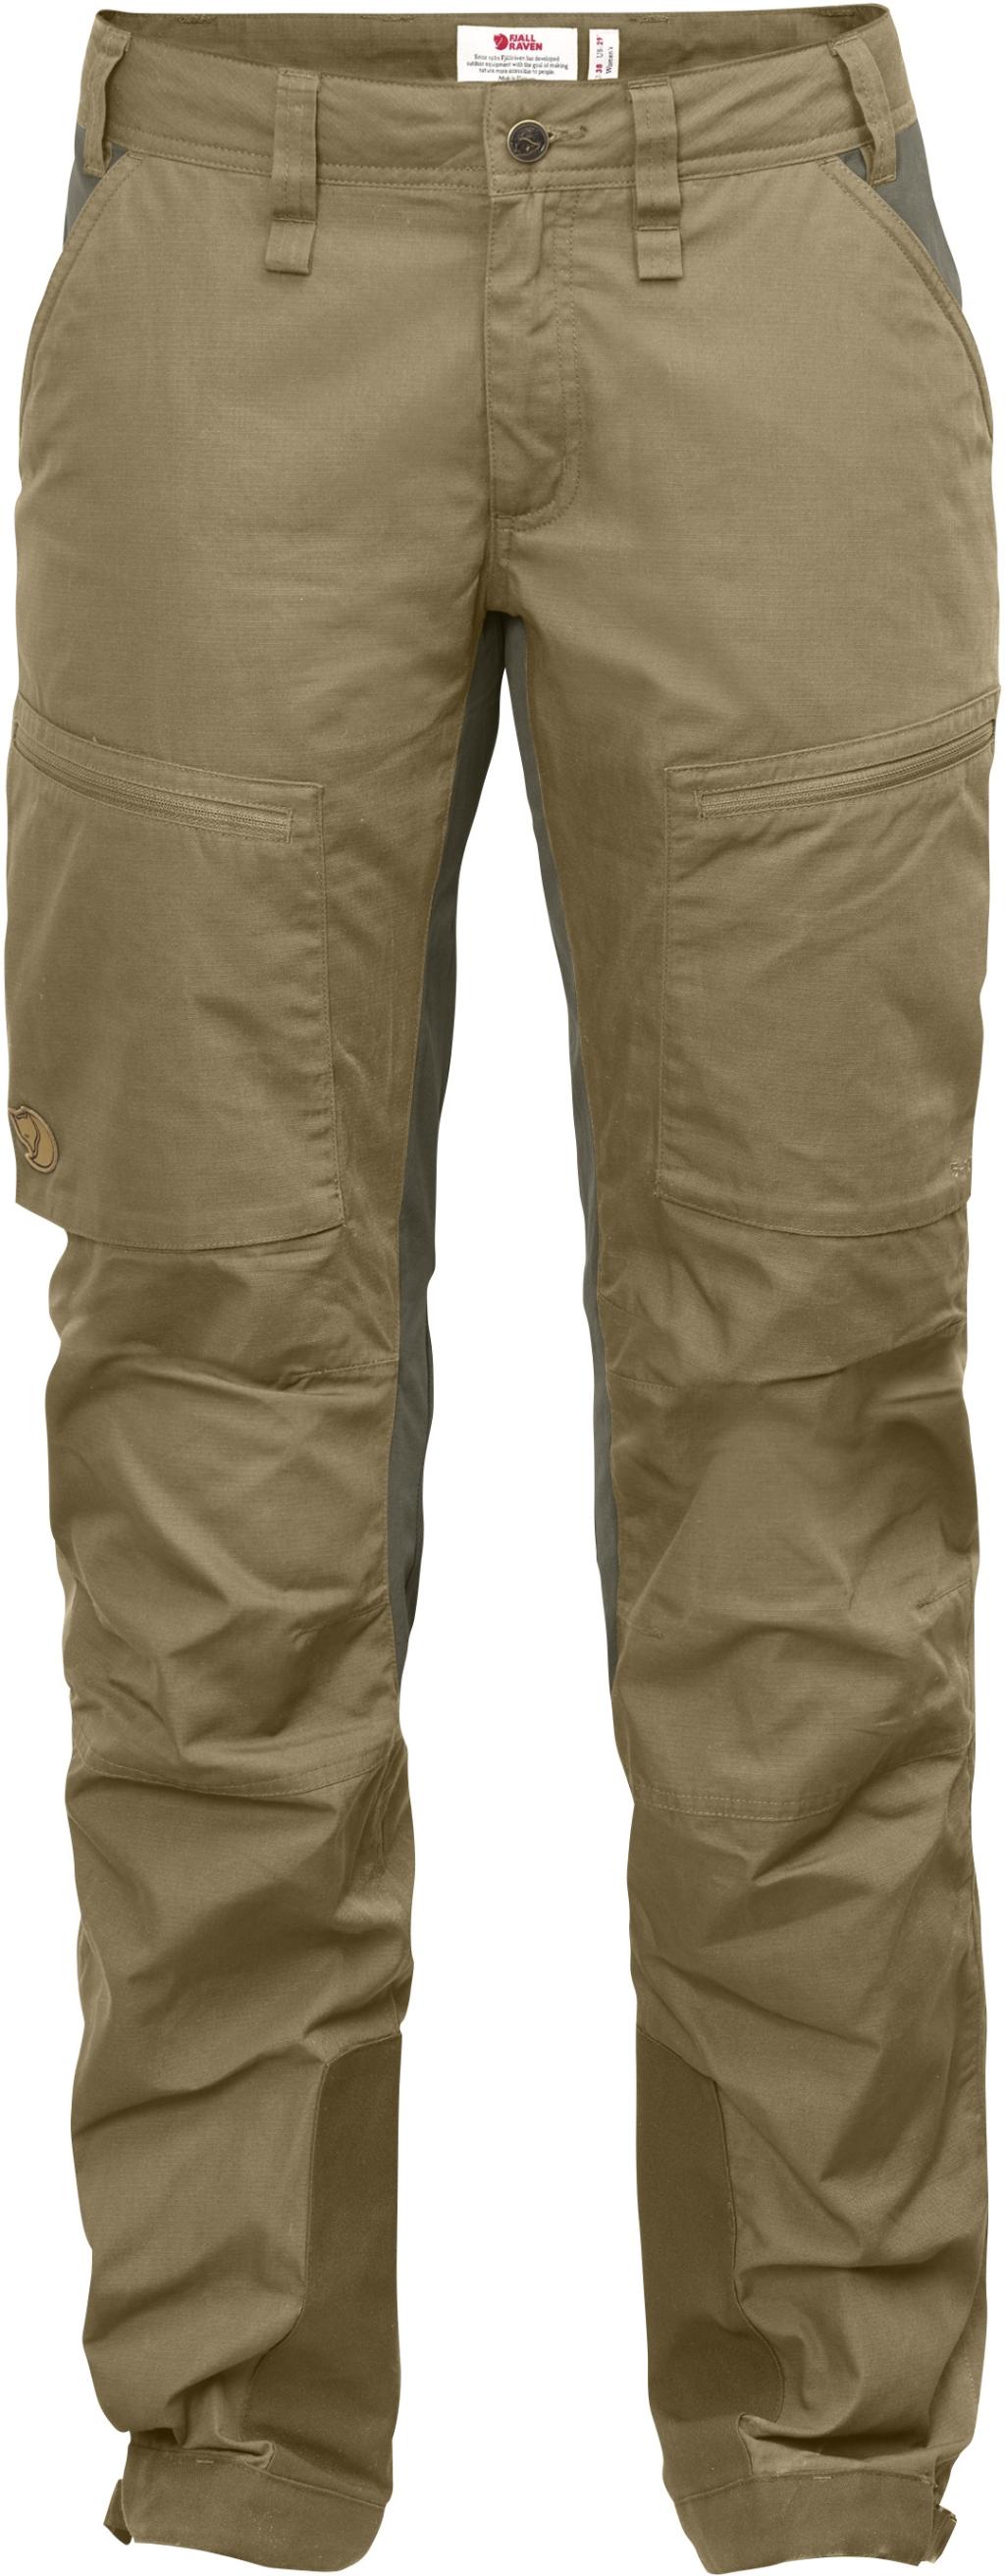 FjallRaven Abisko Lite Trekking Trousers W Sand-30